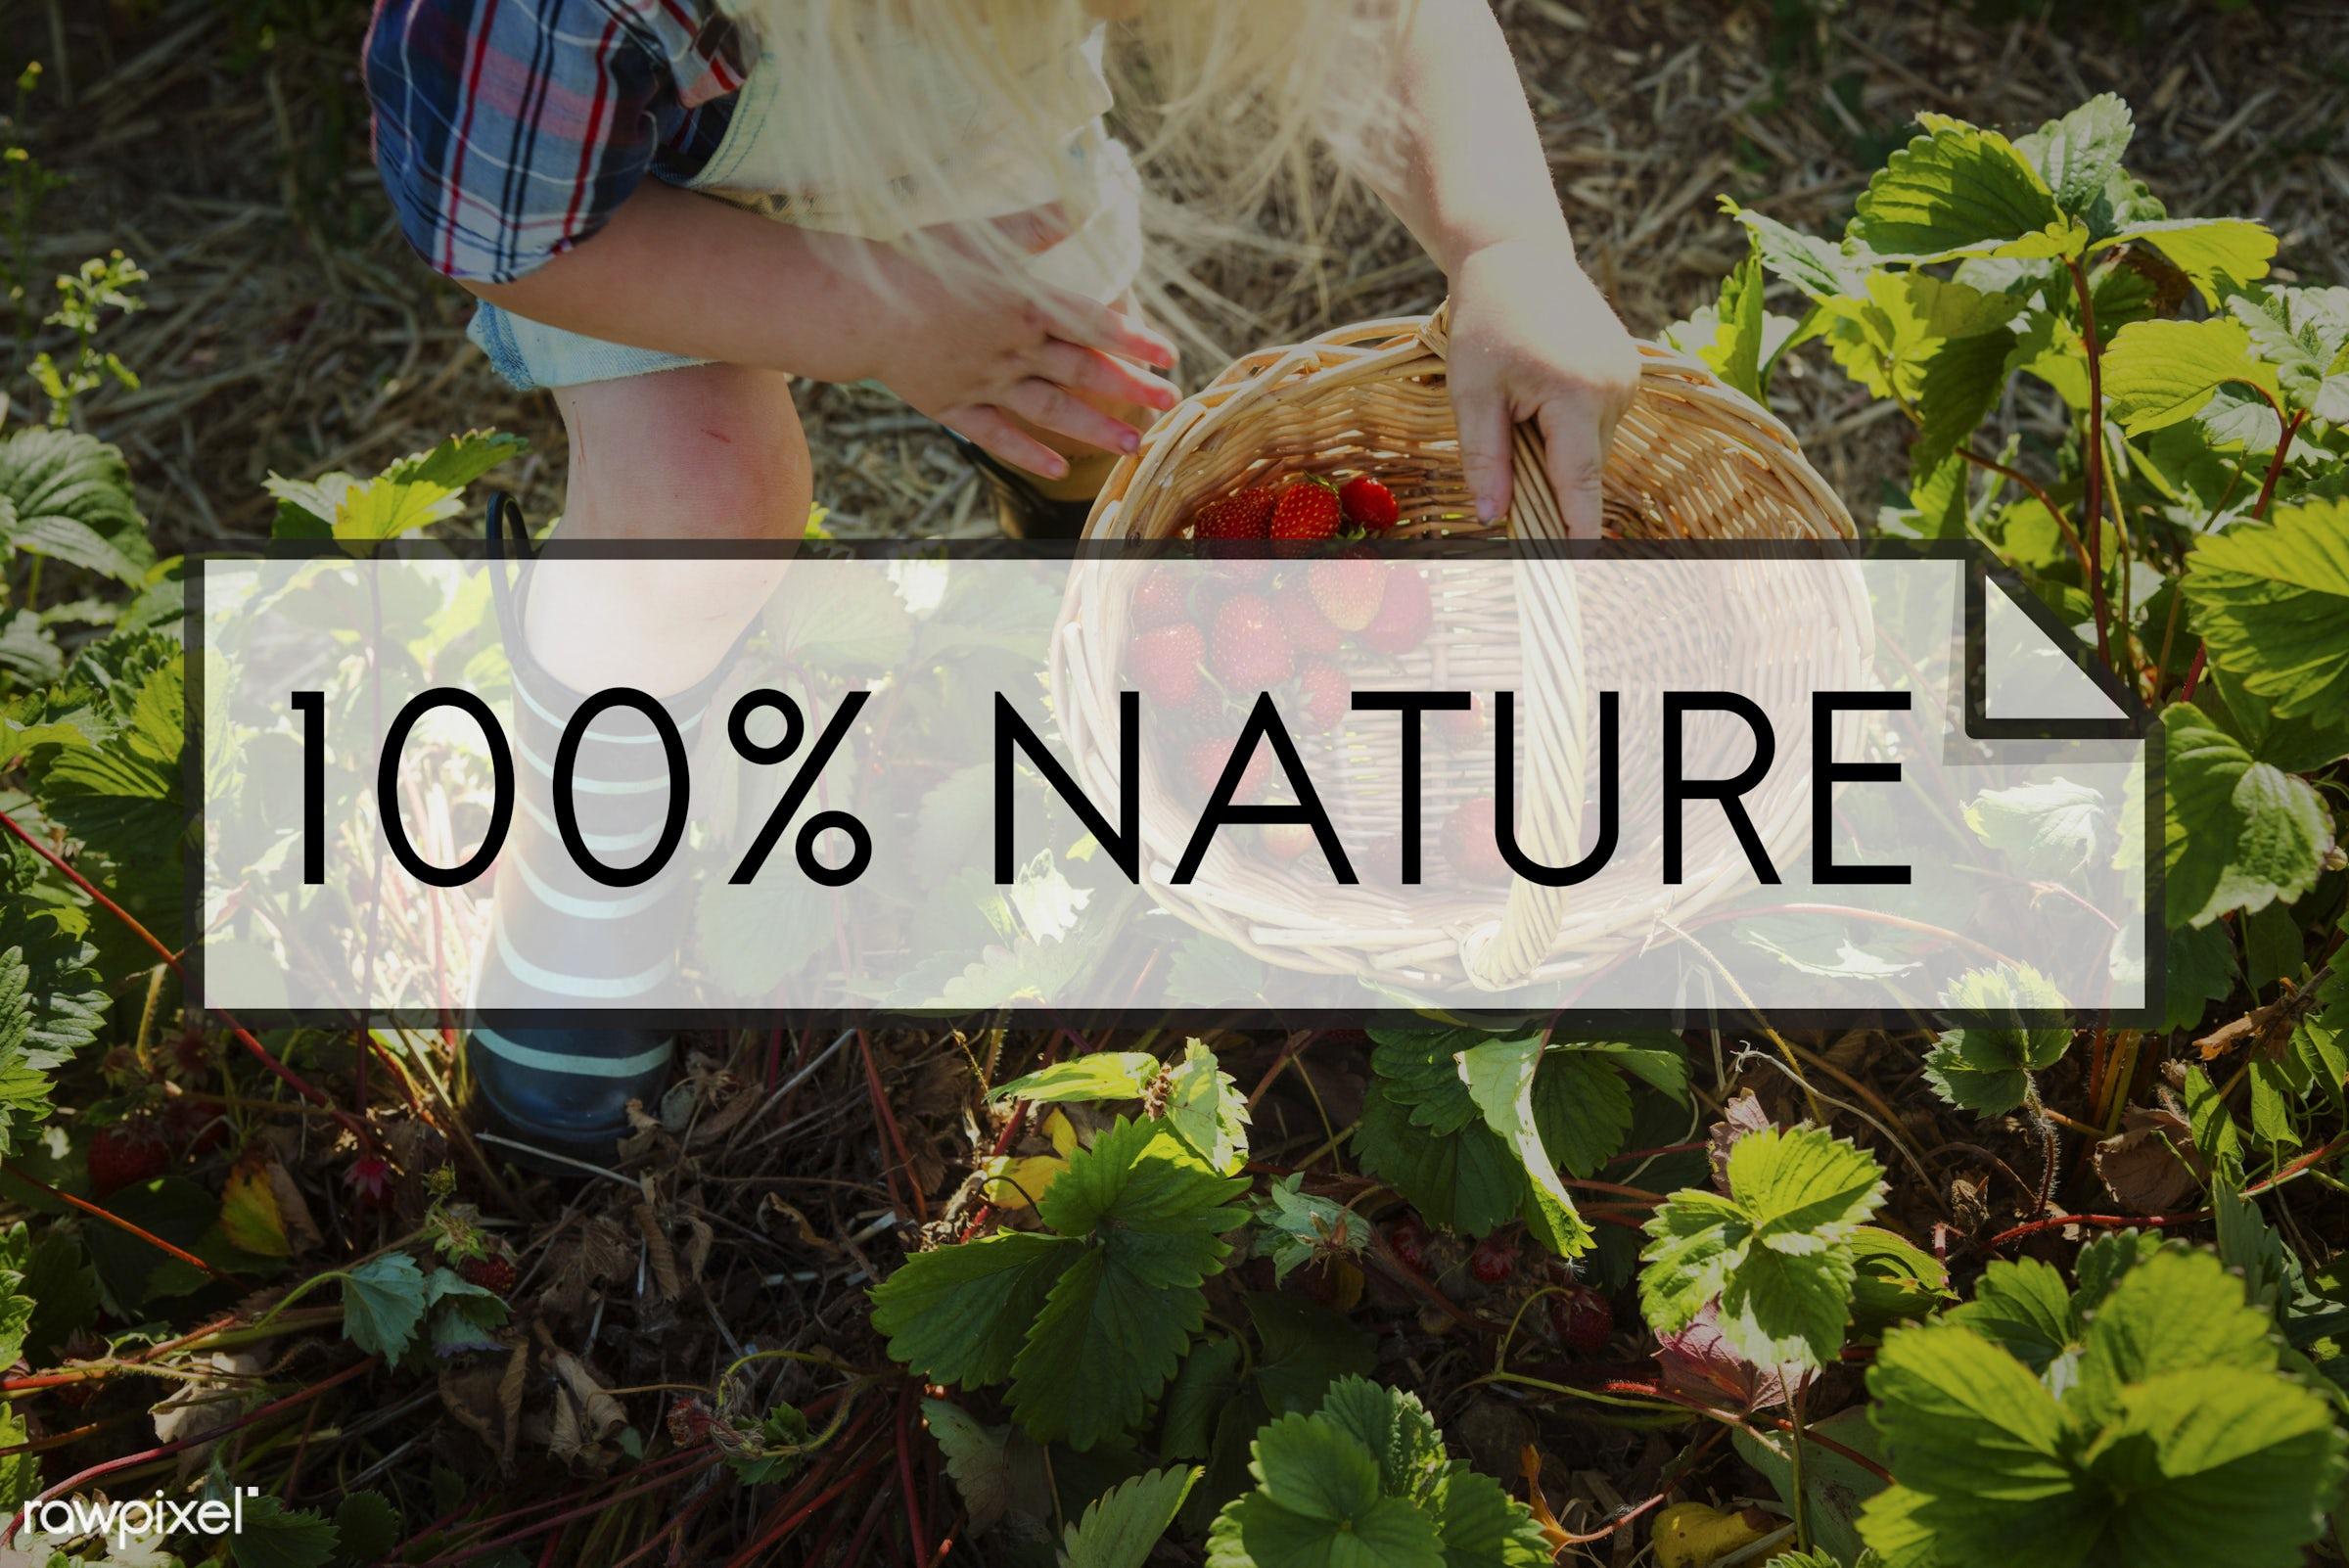 100% natural, 100% nature, basket, blonde, boy, caucasian, dungarees, eat fresh, farm, freshly picked, freshness, fruit, fun...